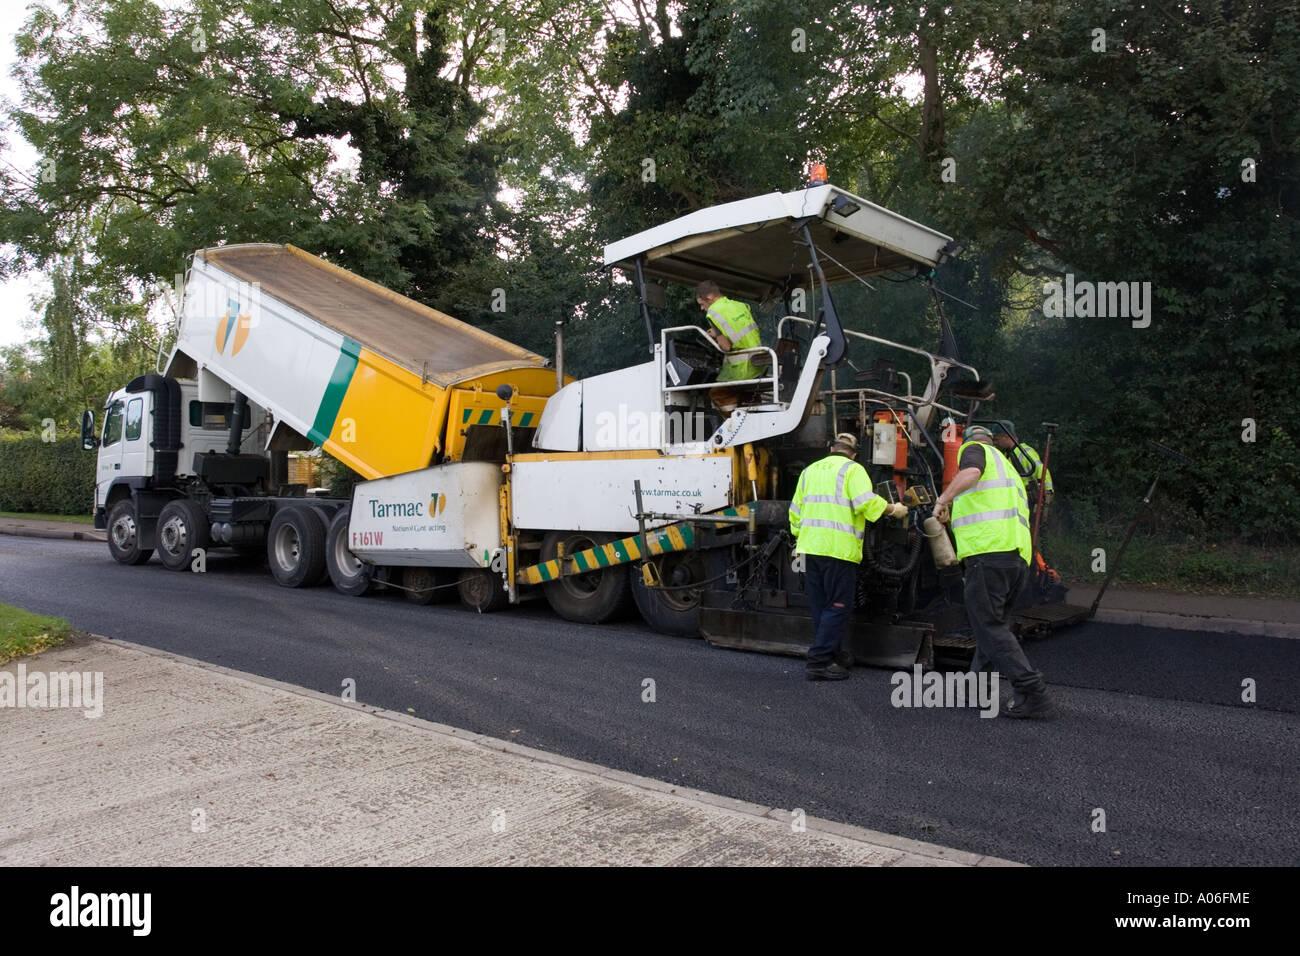 Tarmac asphalt being laid to r...